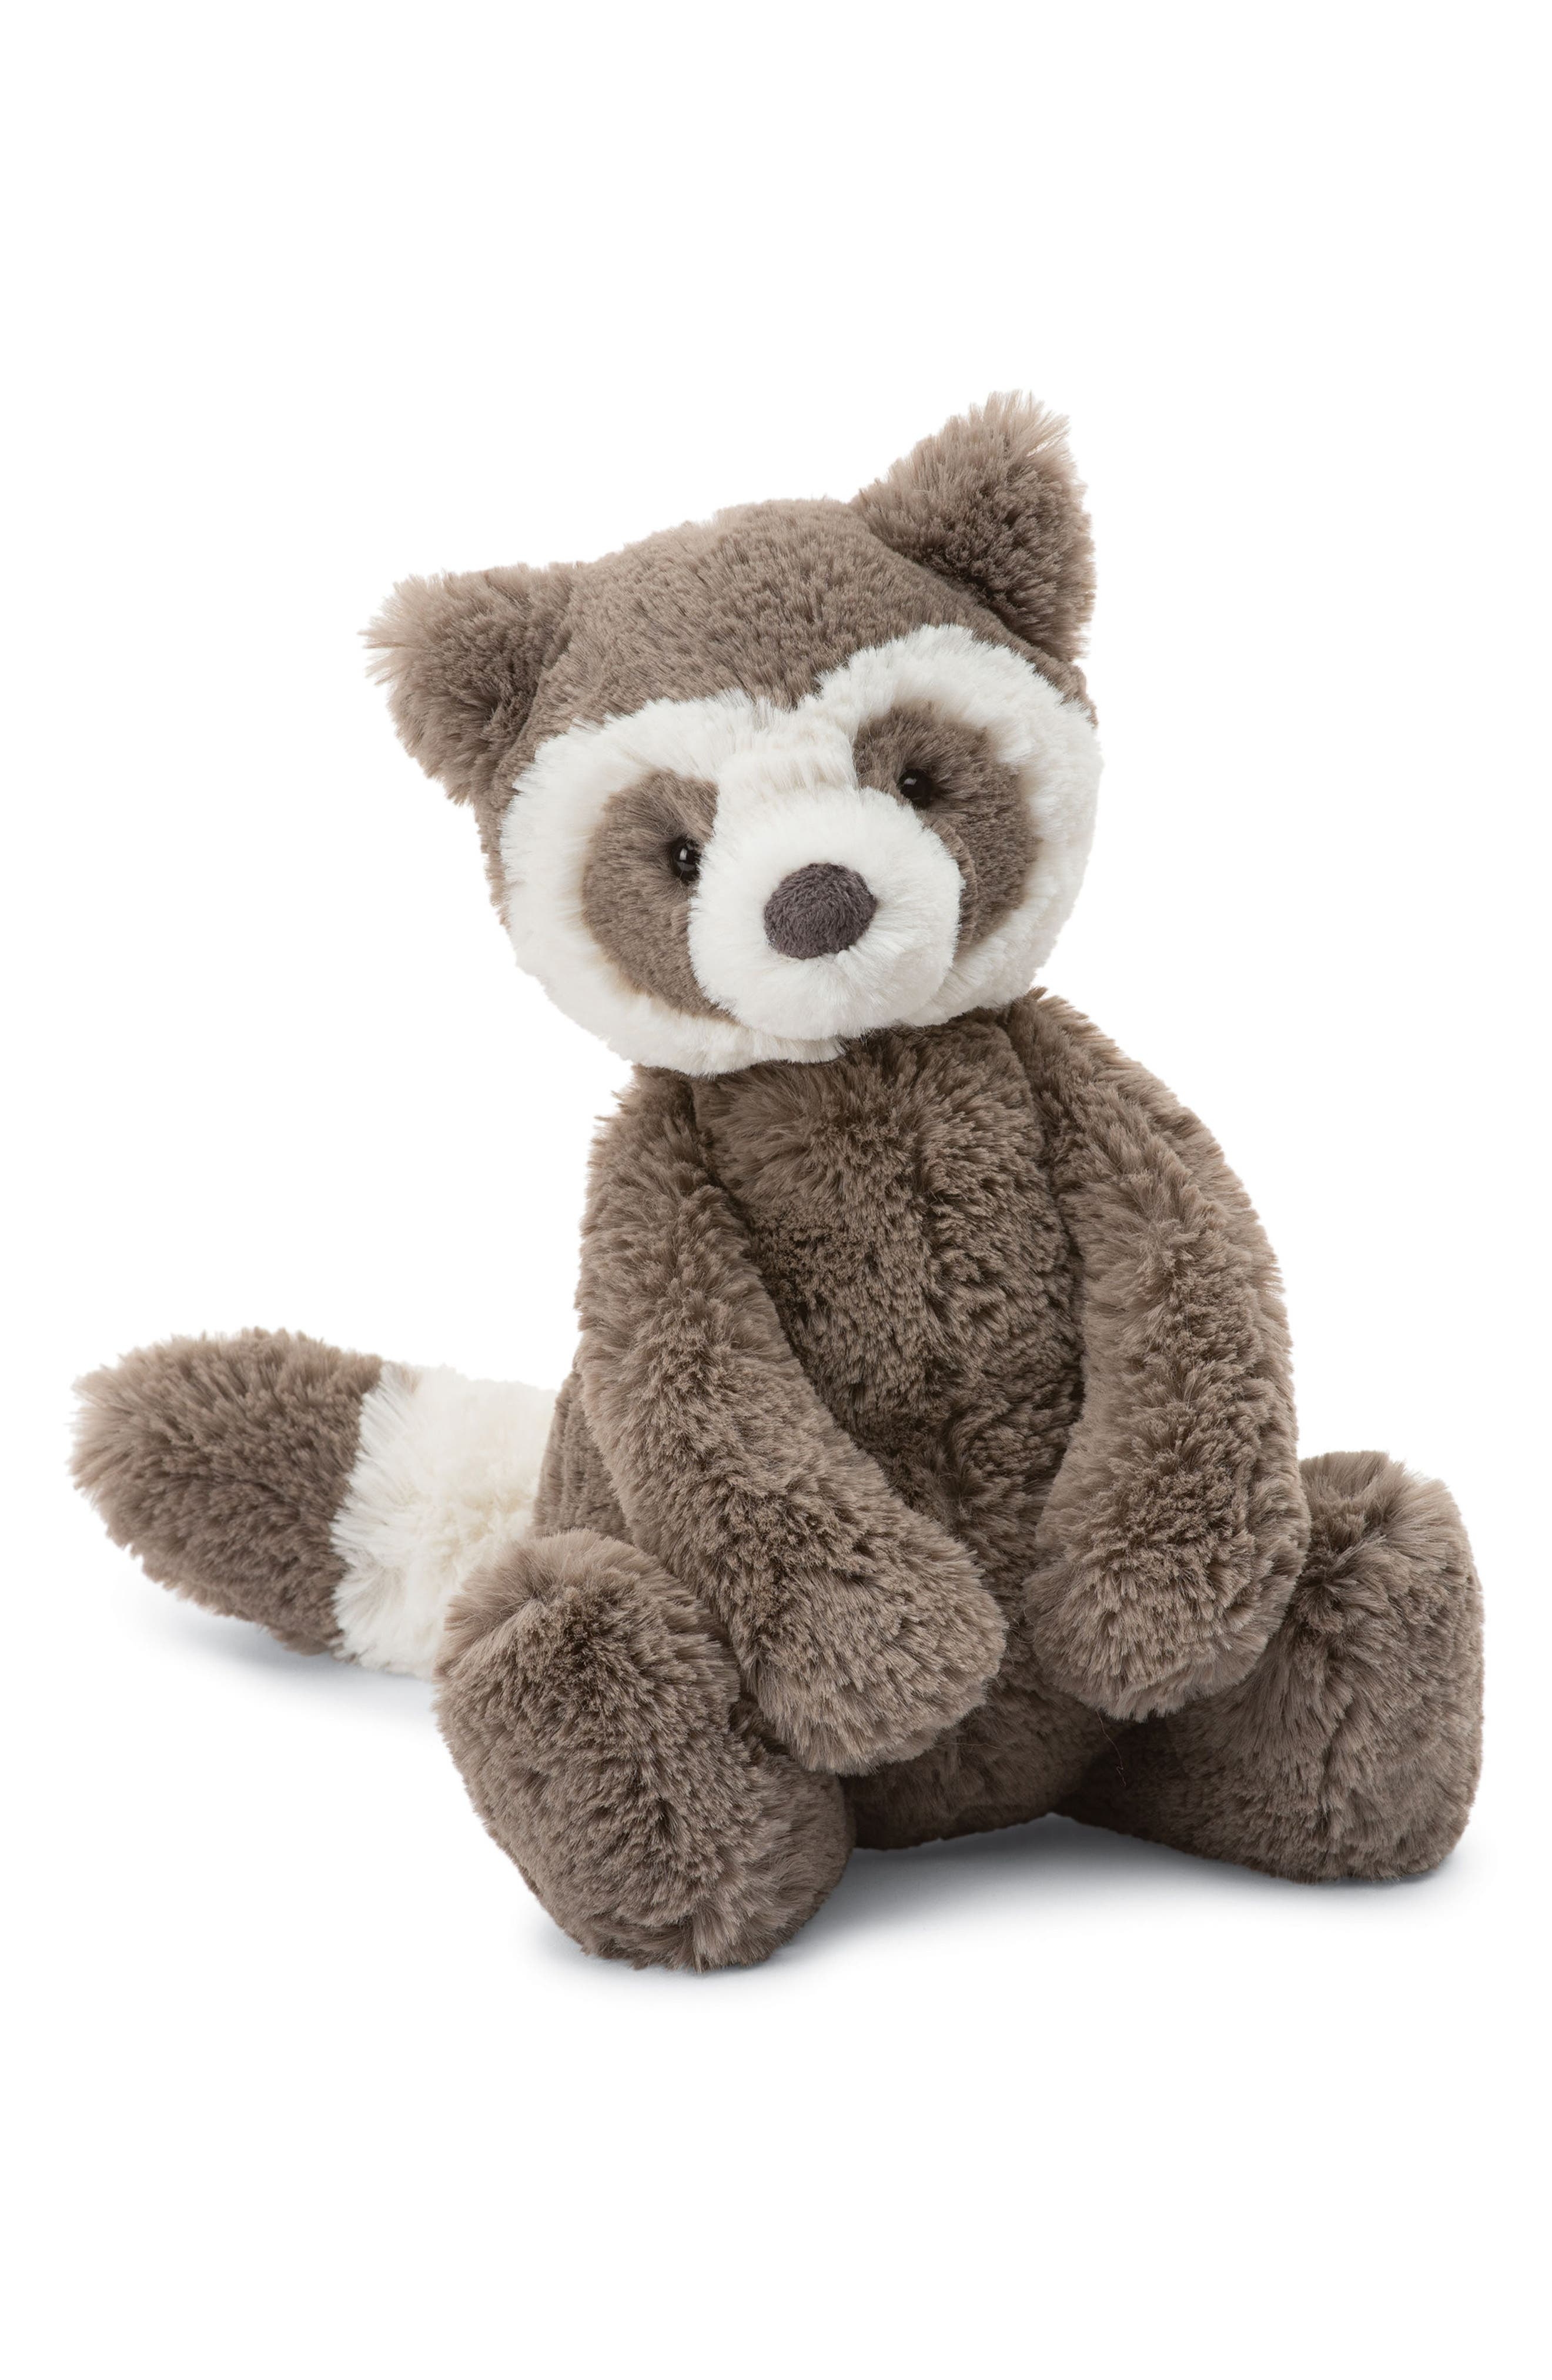 Infant Jellycat Bashful Raccoon Stuffed Animal